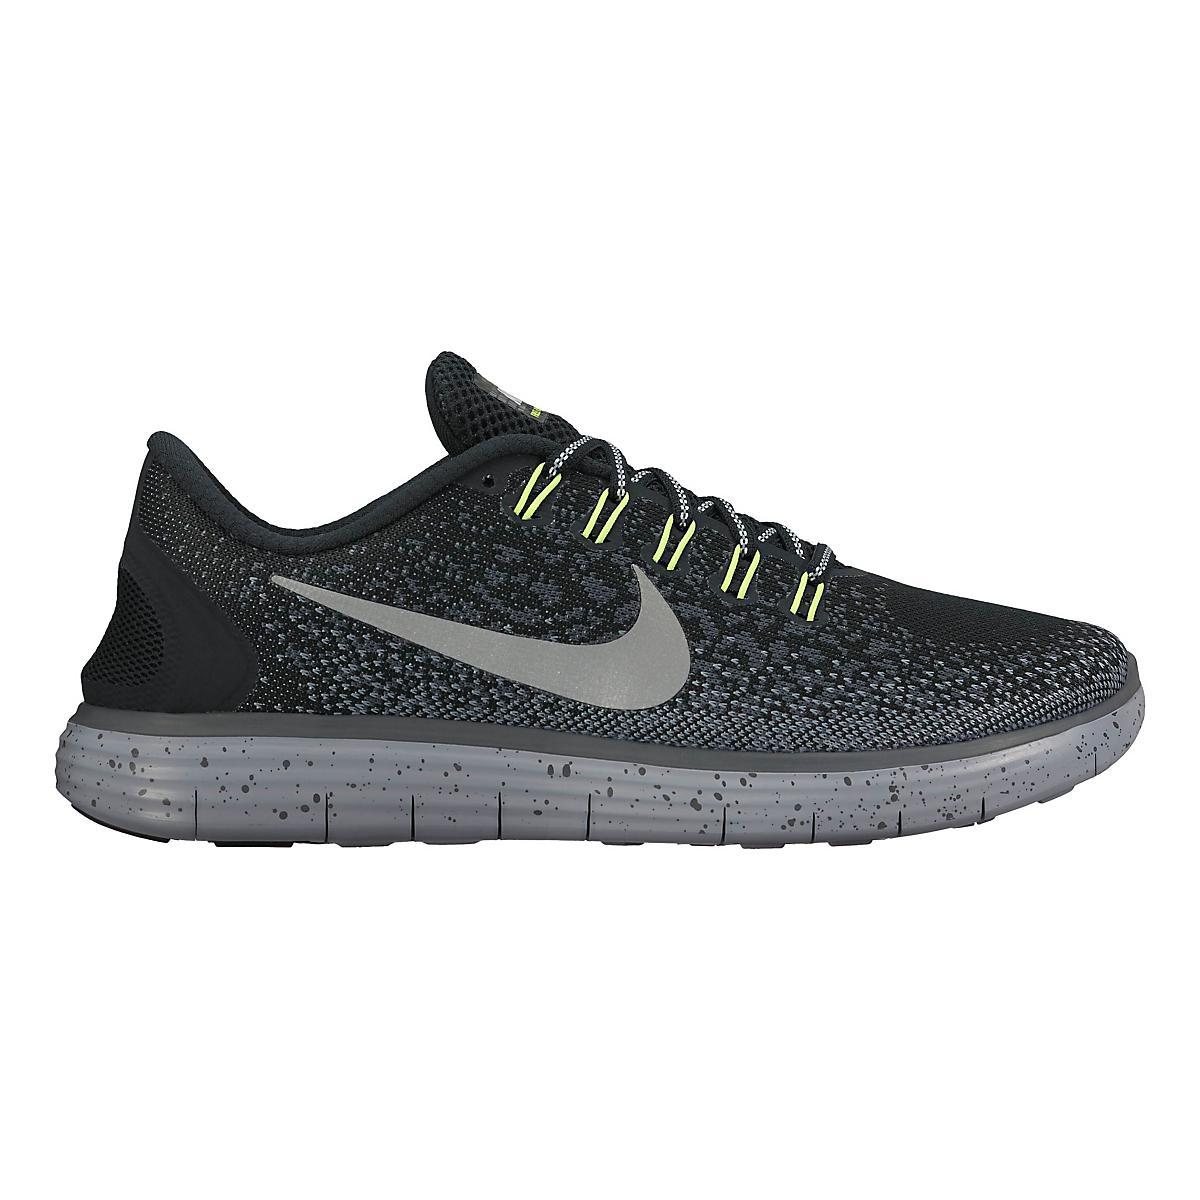 d0e924cab9f9b Womens Nike Free RN Distance Shield Running Shoe at Road Runner Sports